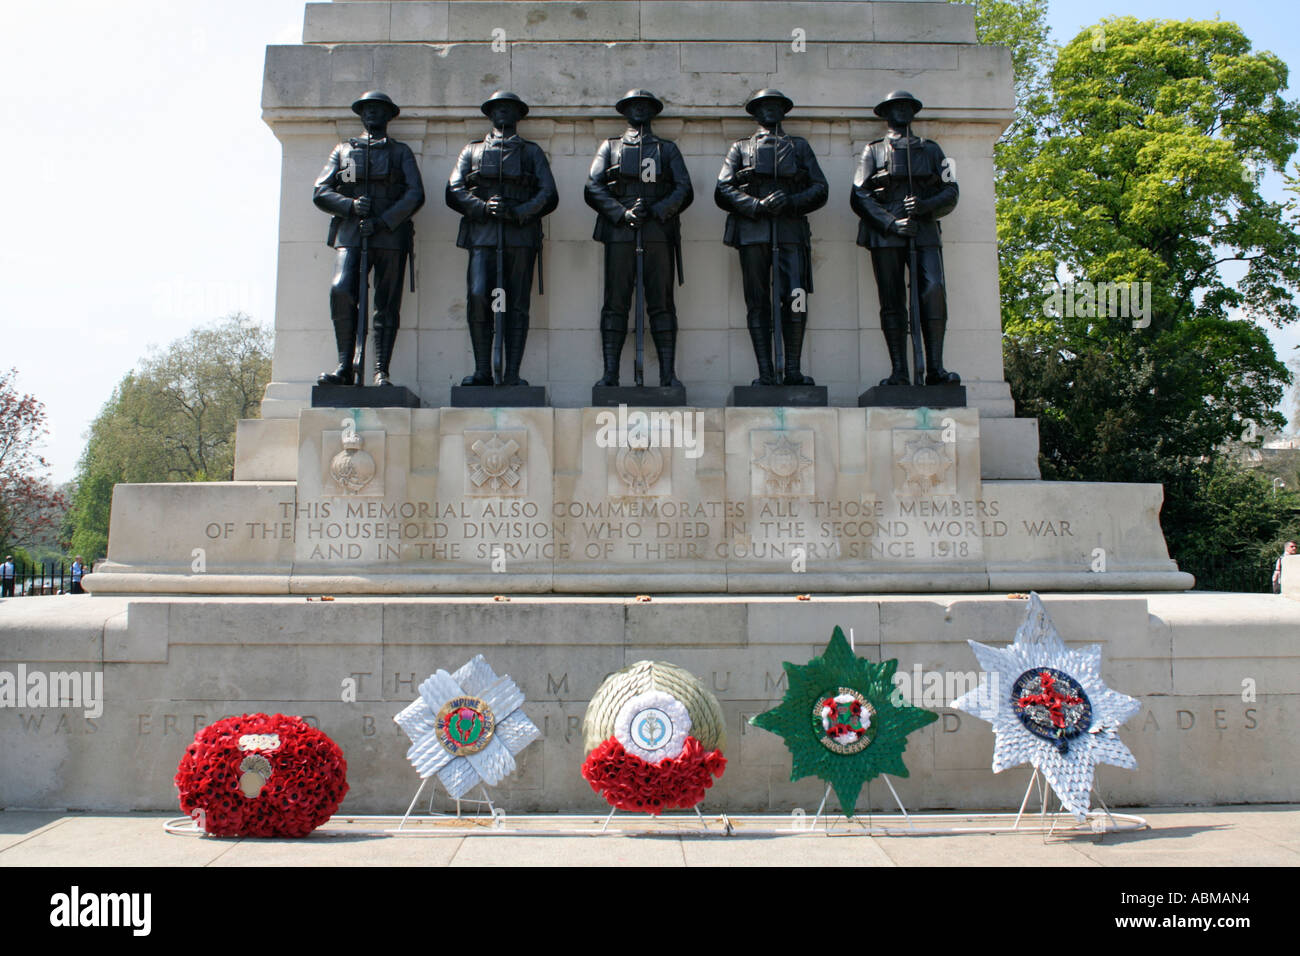 war memorial opposite horseguards parade ground london england uk gb Stock Photo